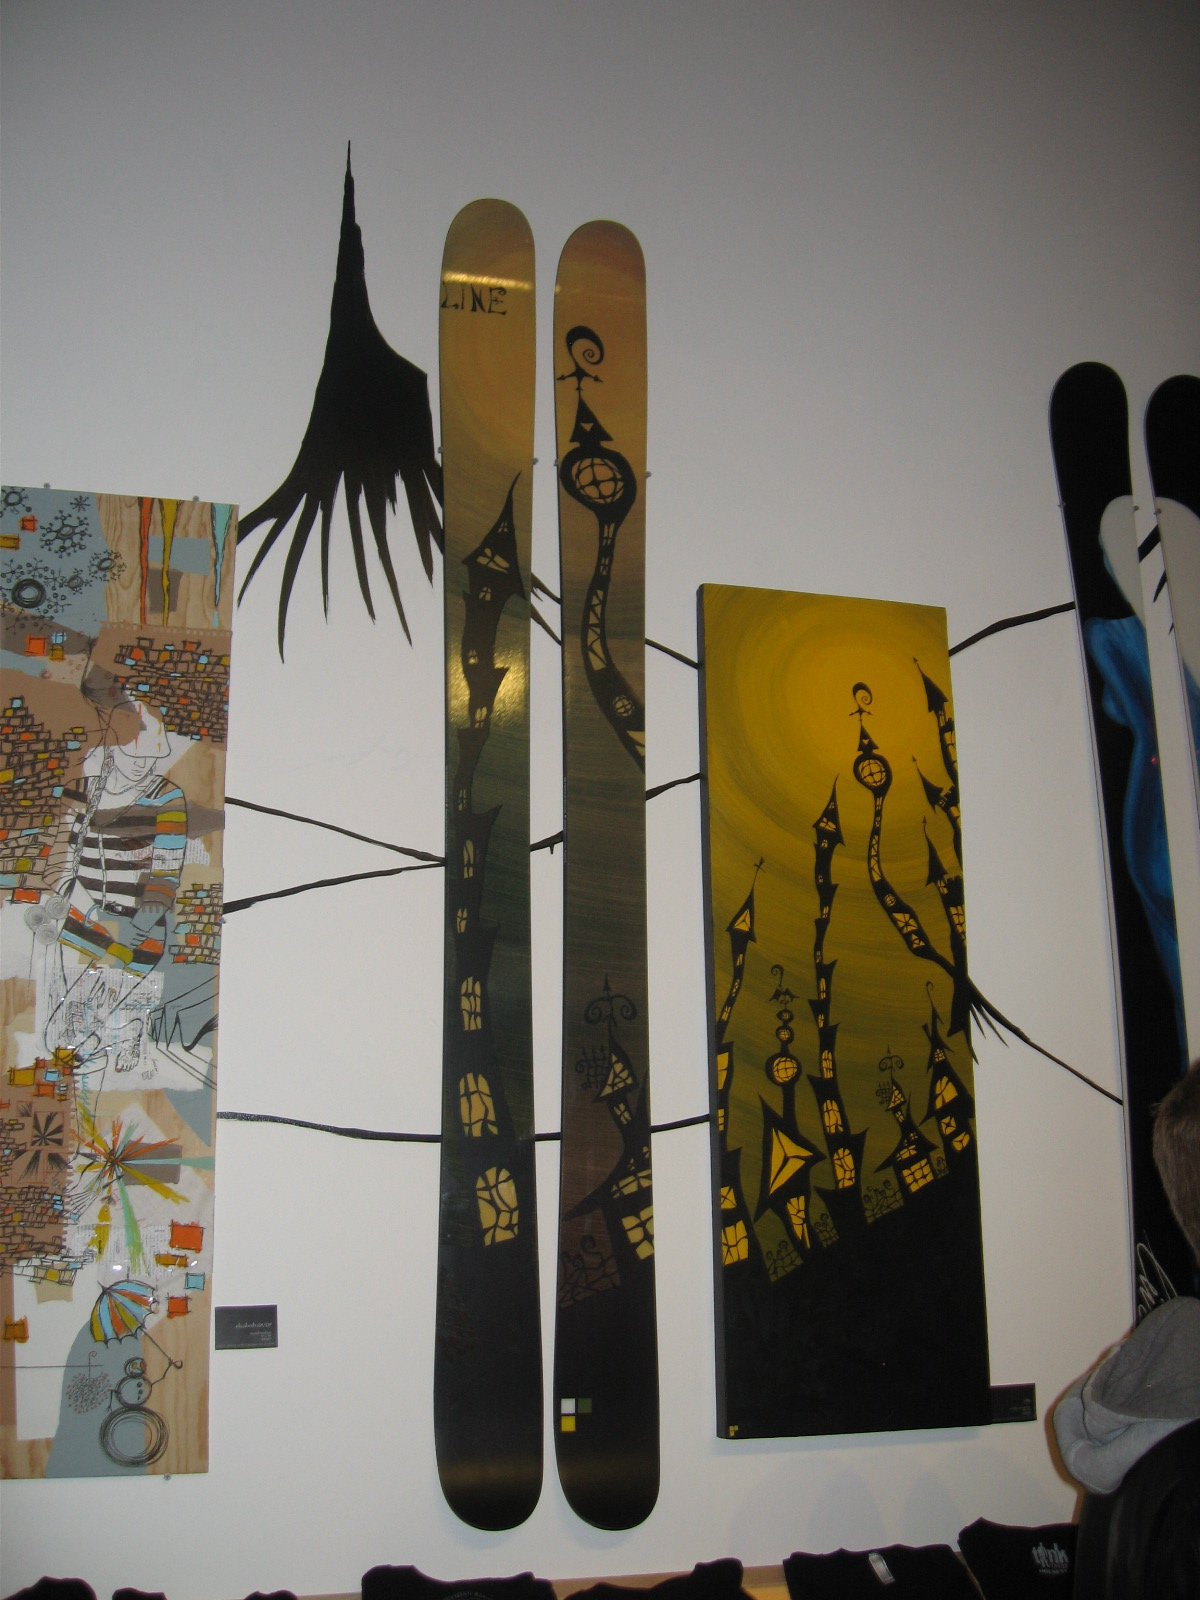 Eric Pollard's Art